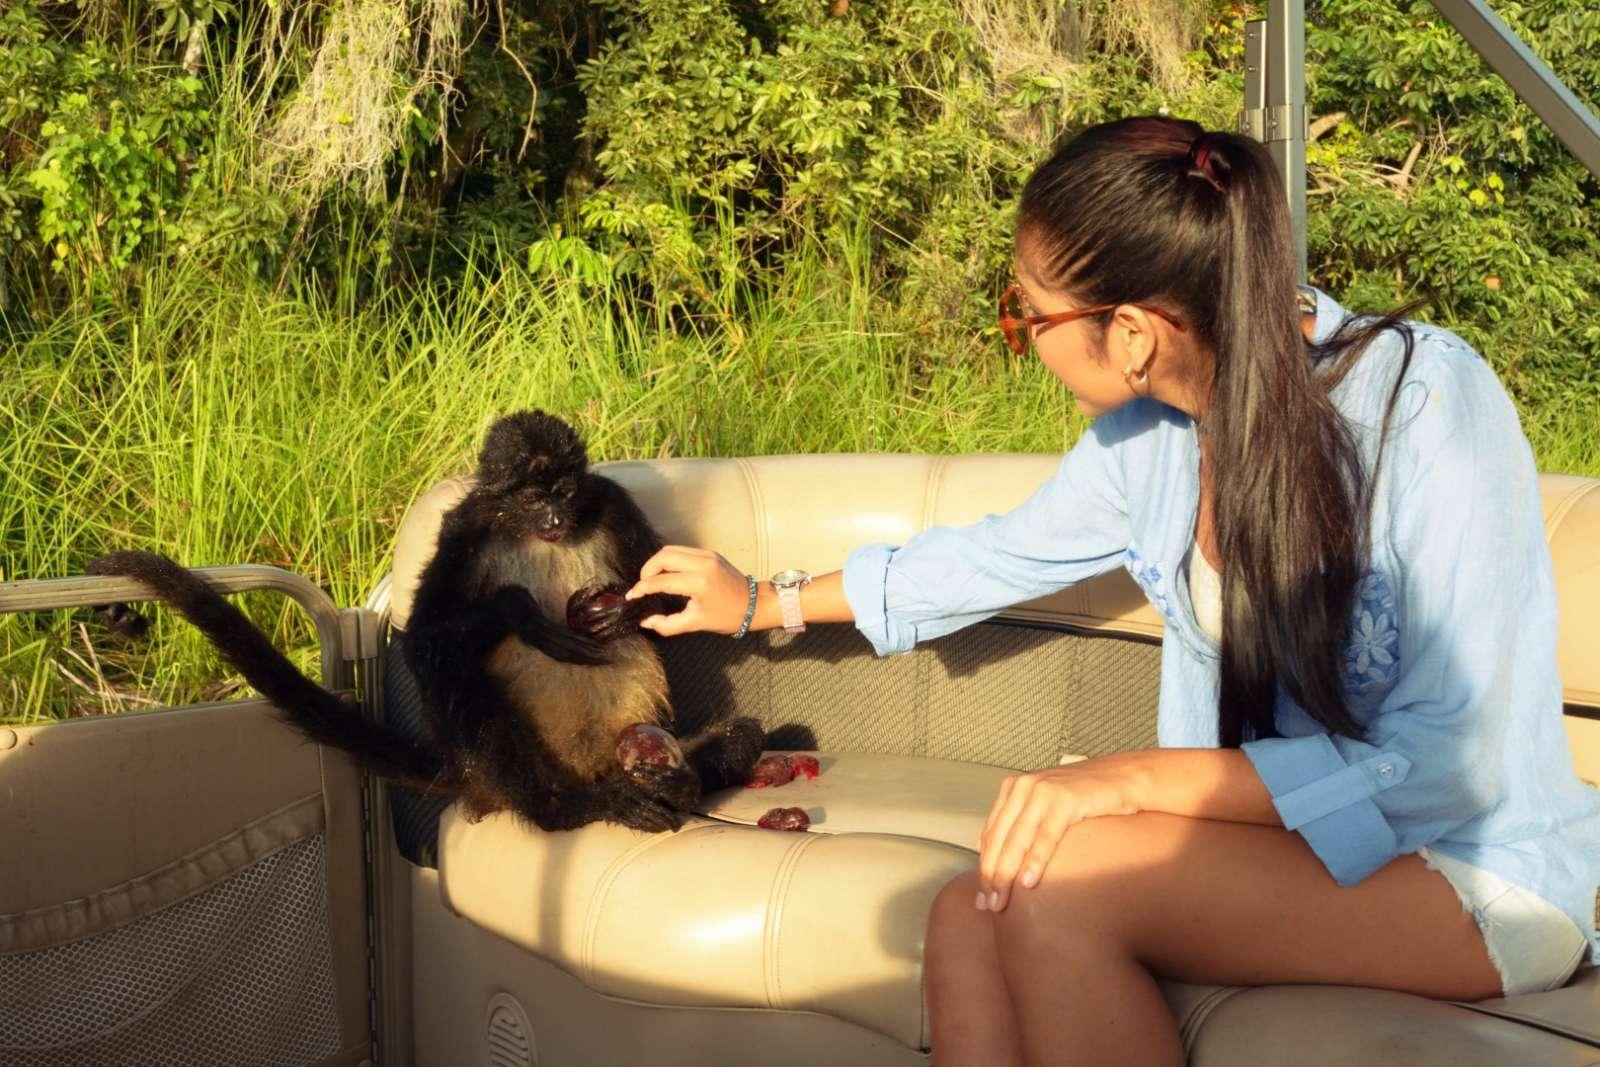 Monkey on boat at Hotel Las Lagunas, Guatemala